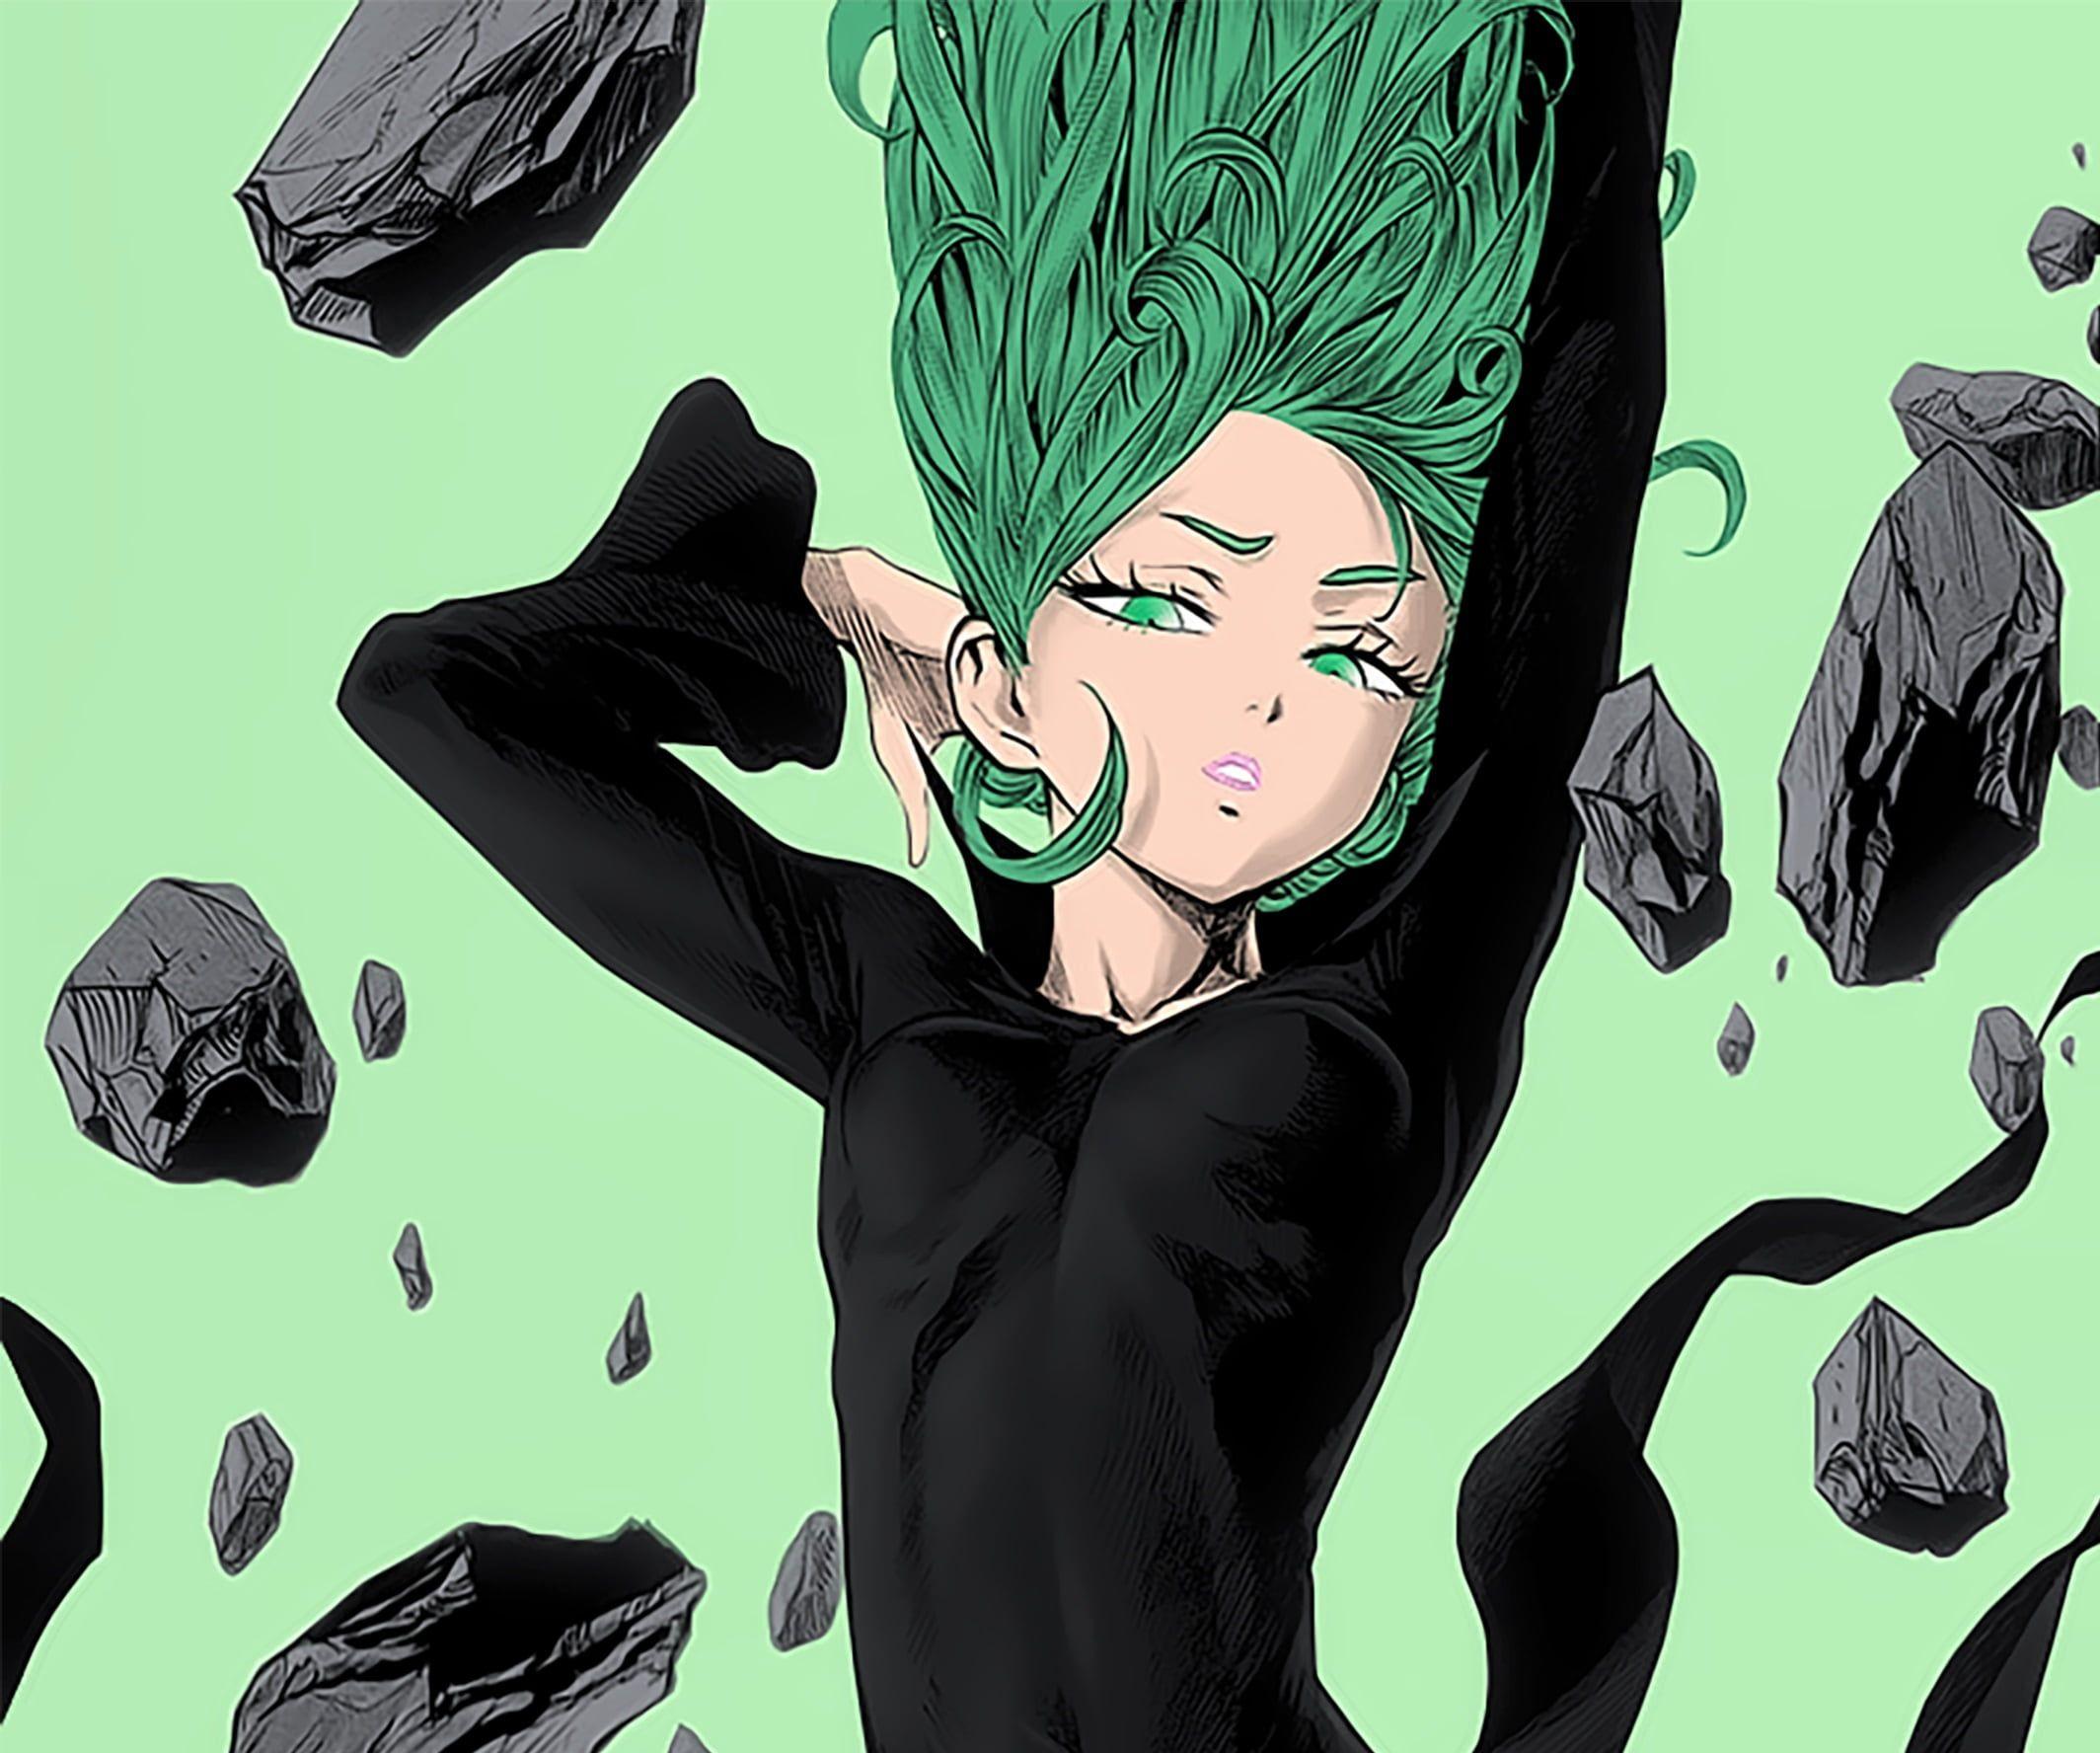 Anime One Punch Man Green Hair One Punch Man Season 2 Tatsumaki One Punch Man 1080p Wallpaper Hdwallp In 2021 One Punch Man One Punch Man Anime Anime Wolf Girl Anime wallpaper green hair